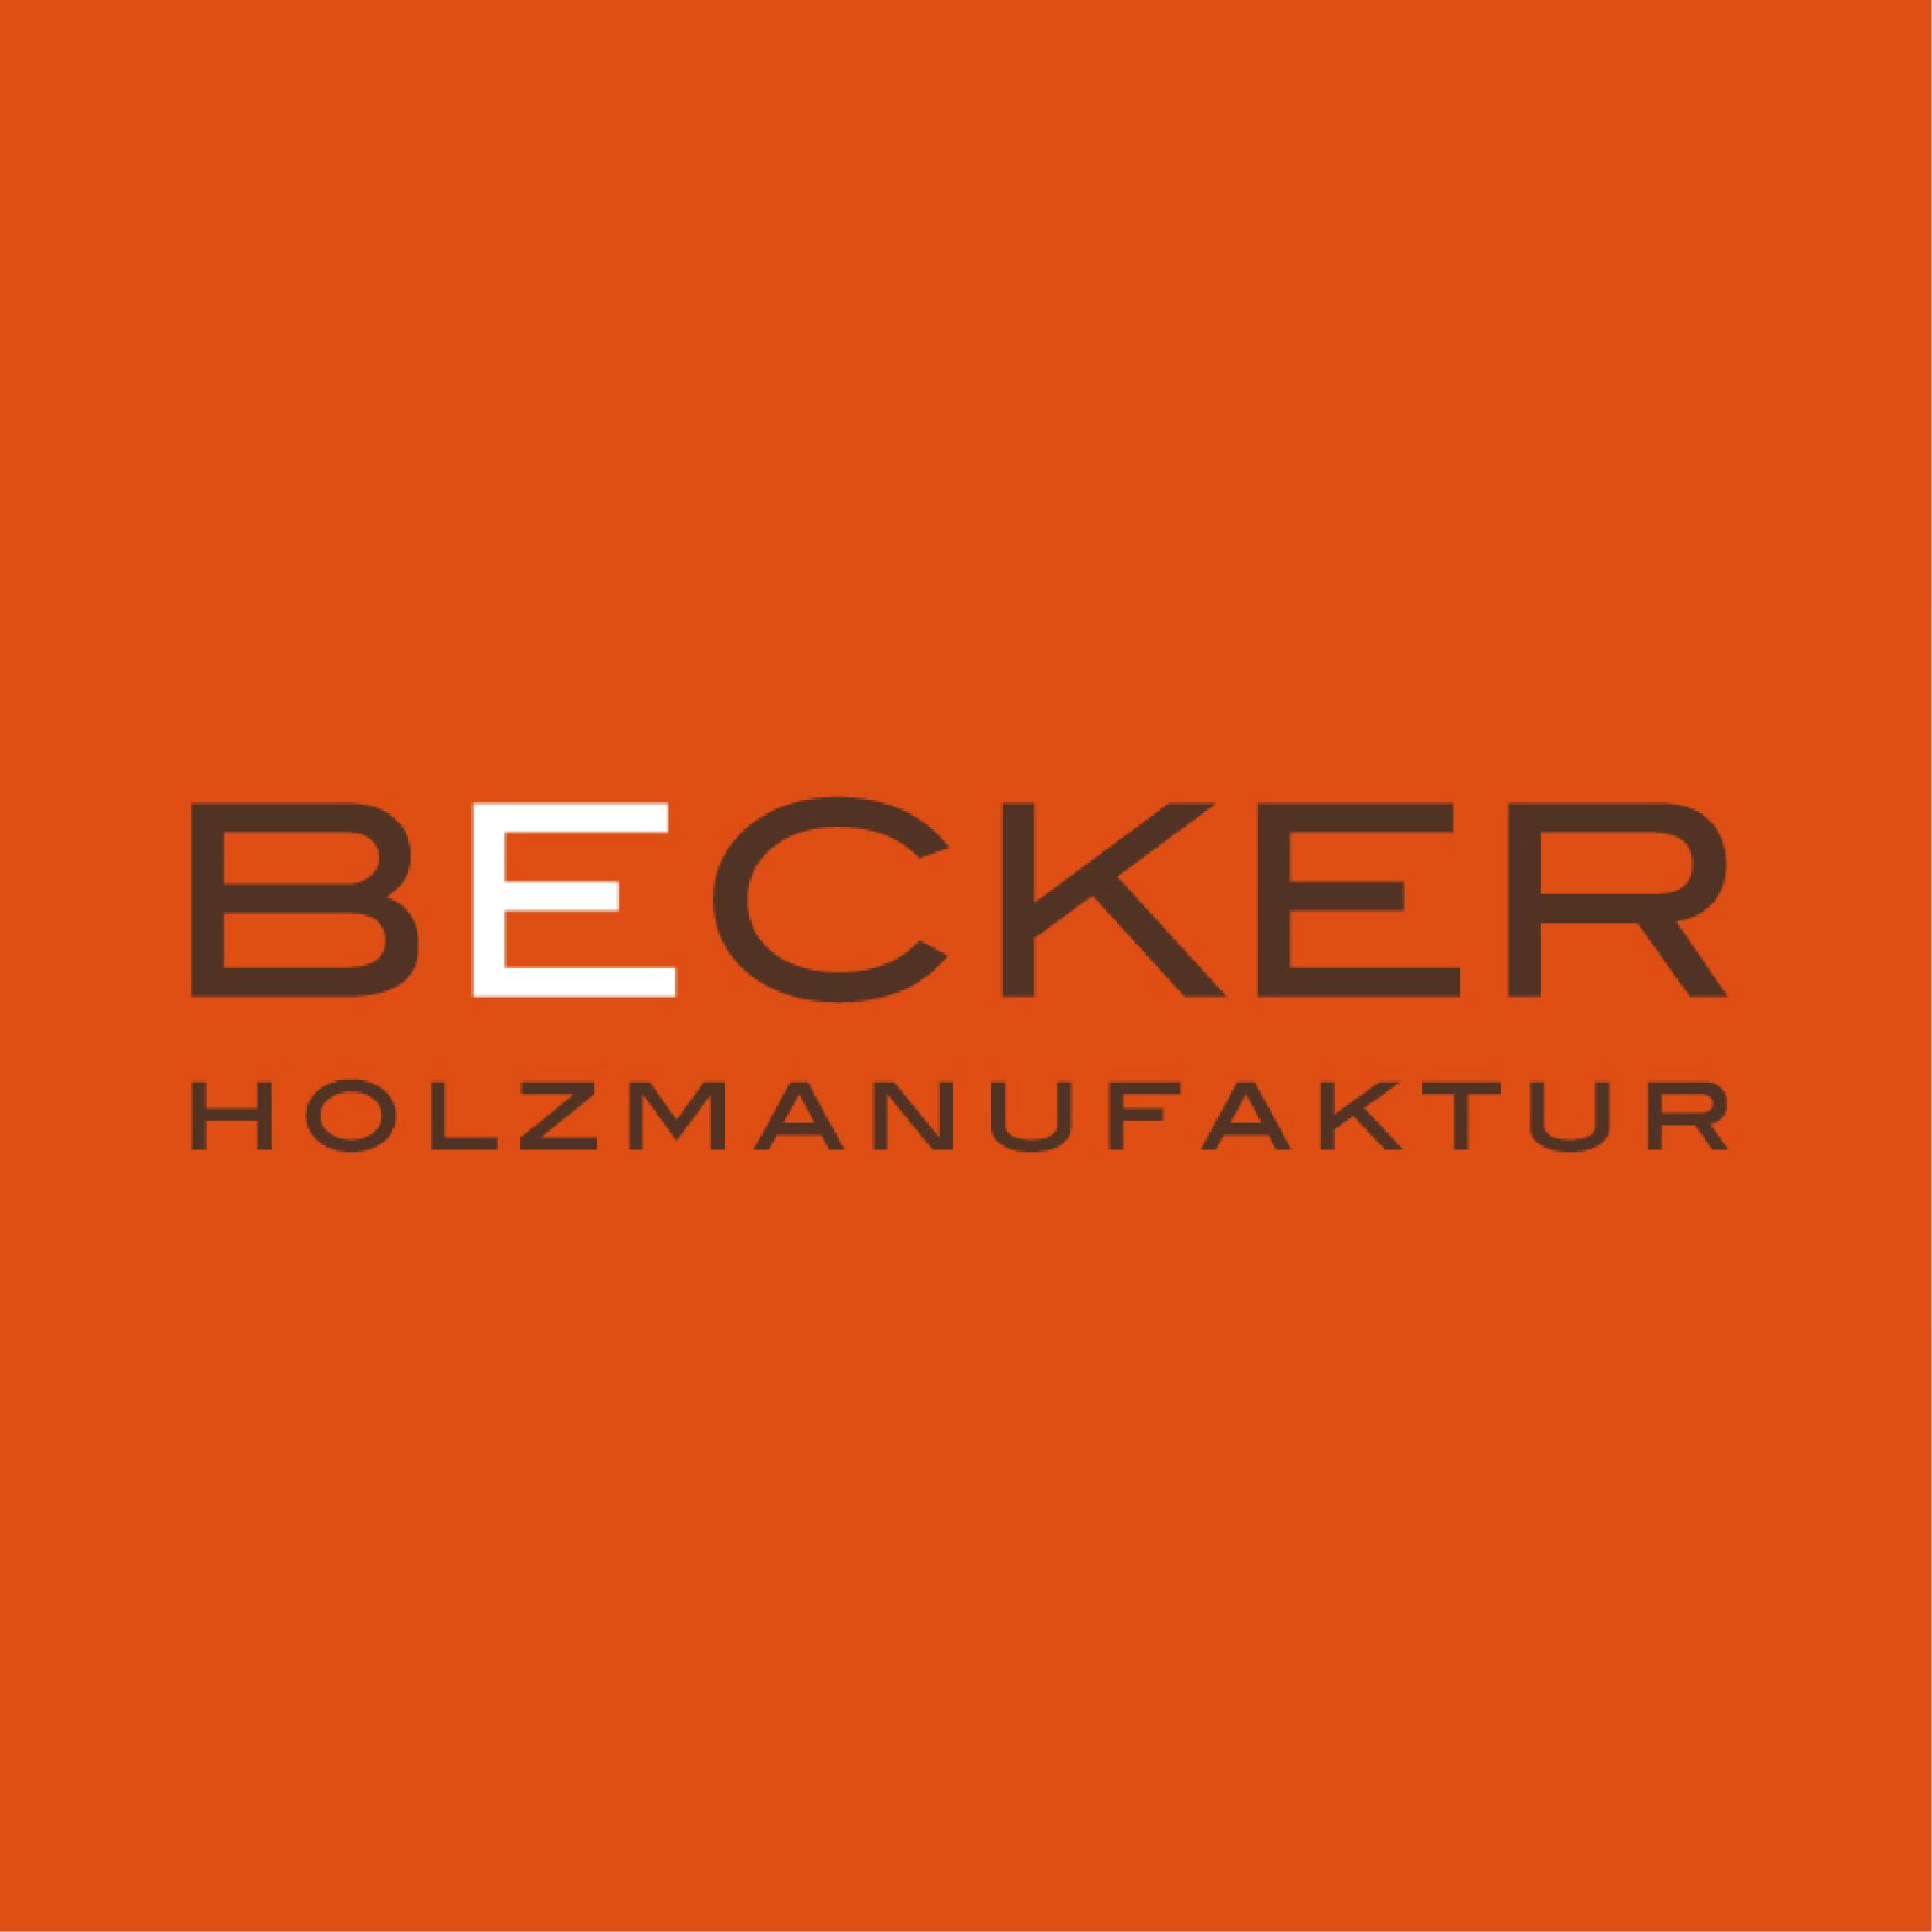 Becker Holzmanufaktur e.K.